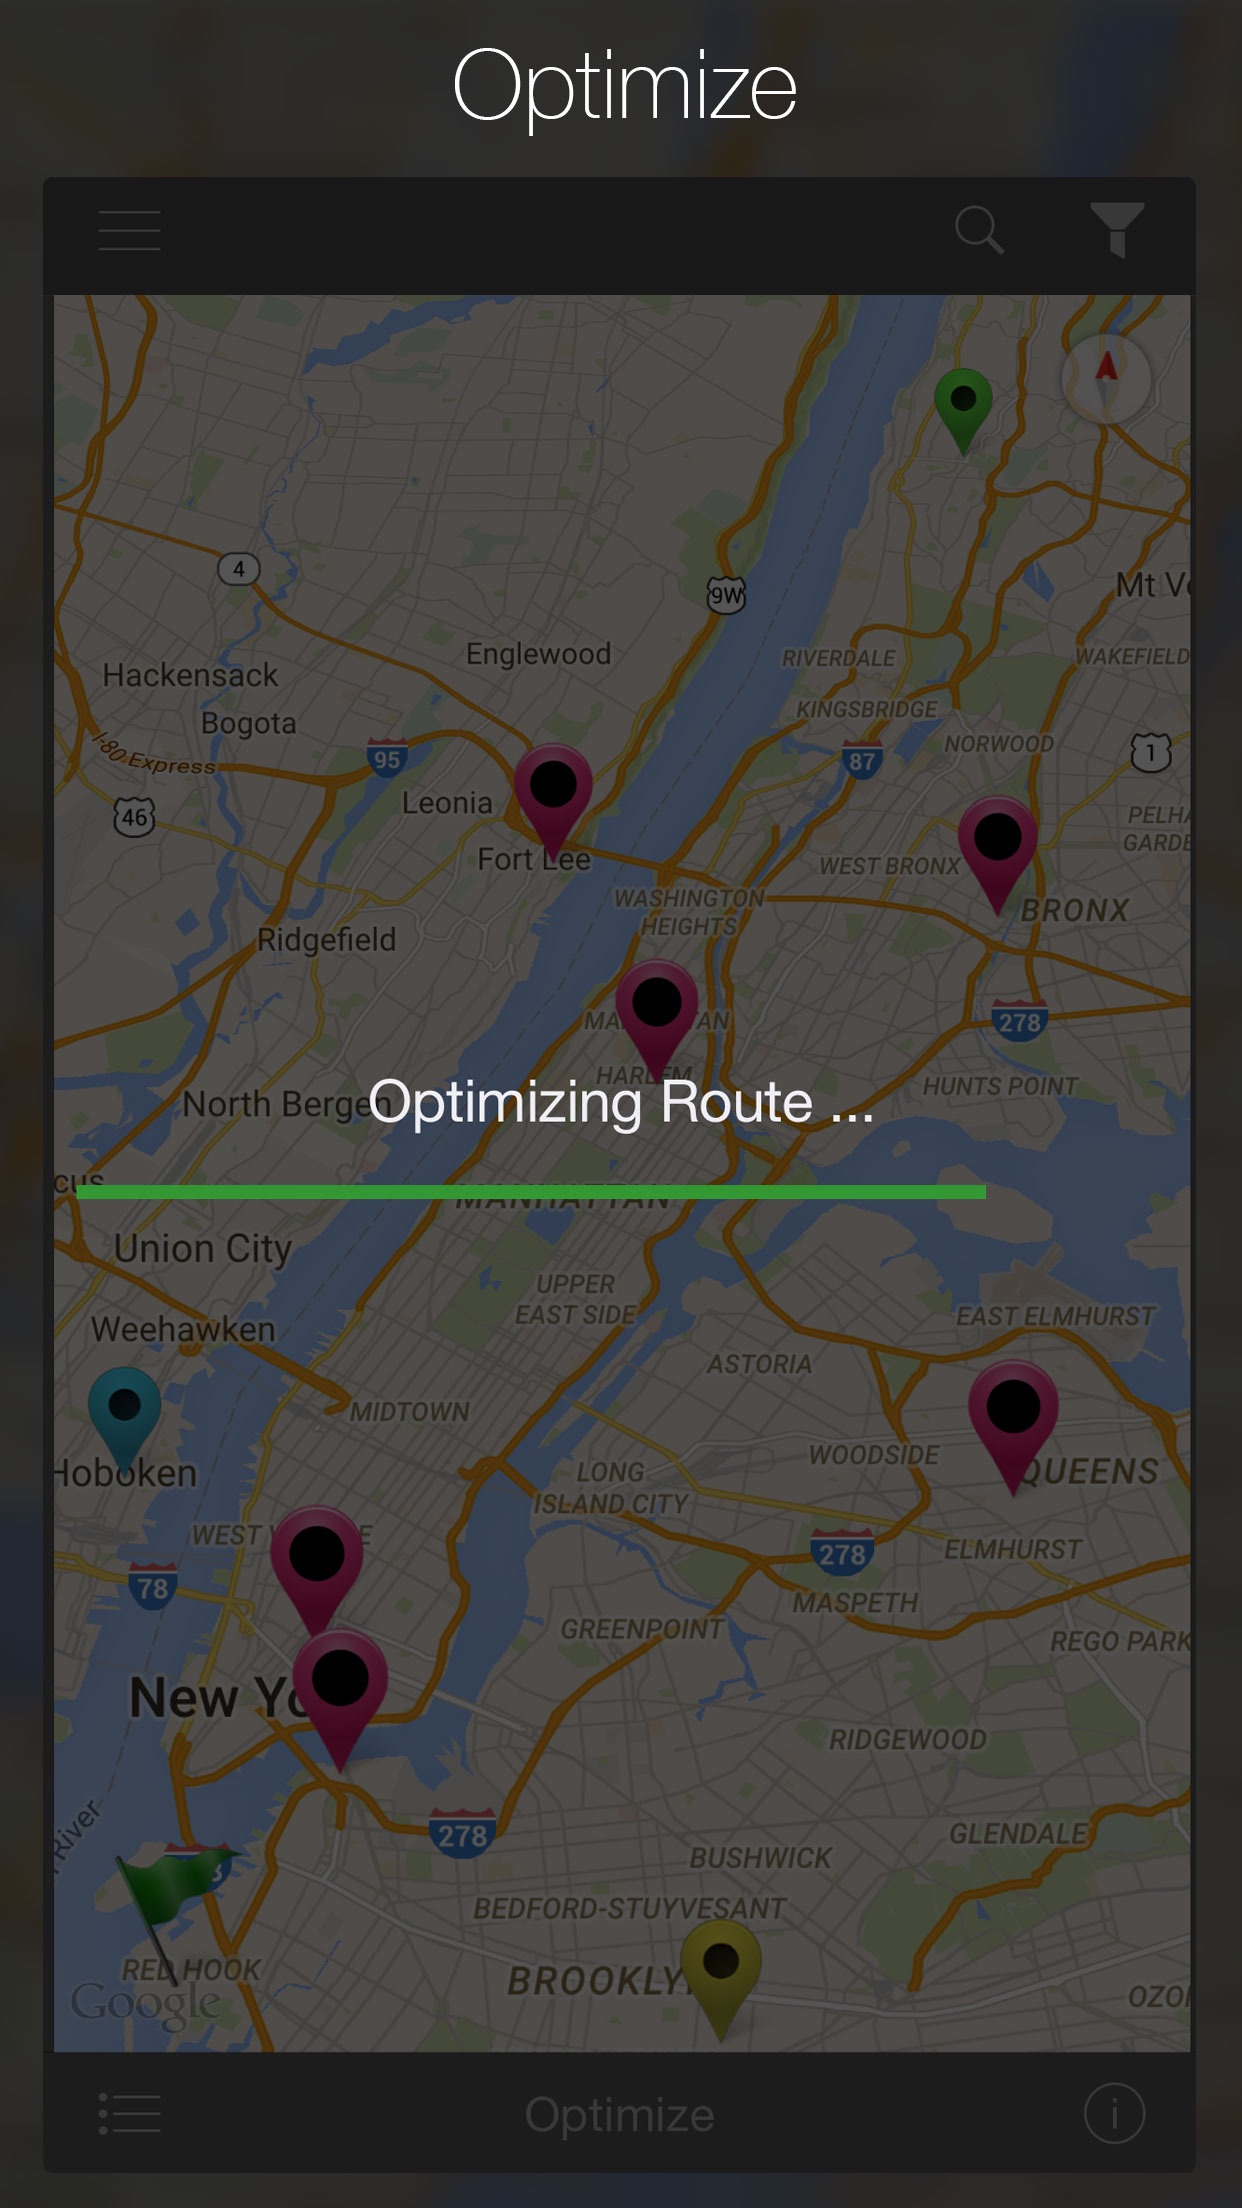 Road Warrior Route Planner Screenshot